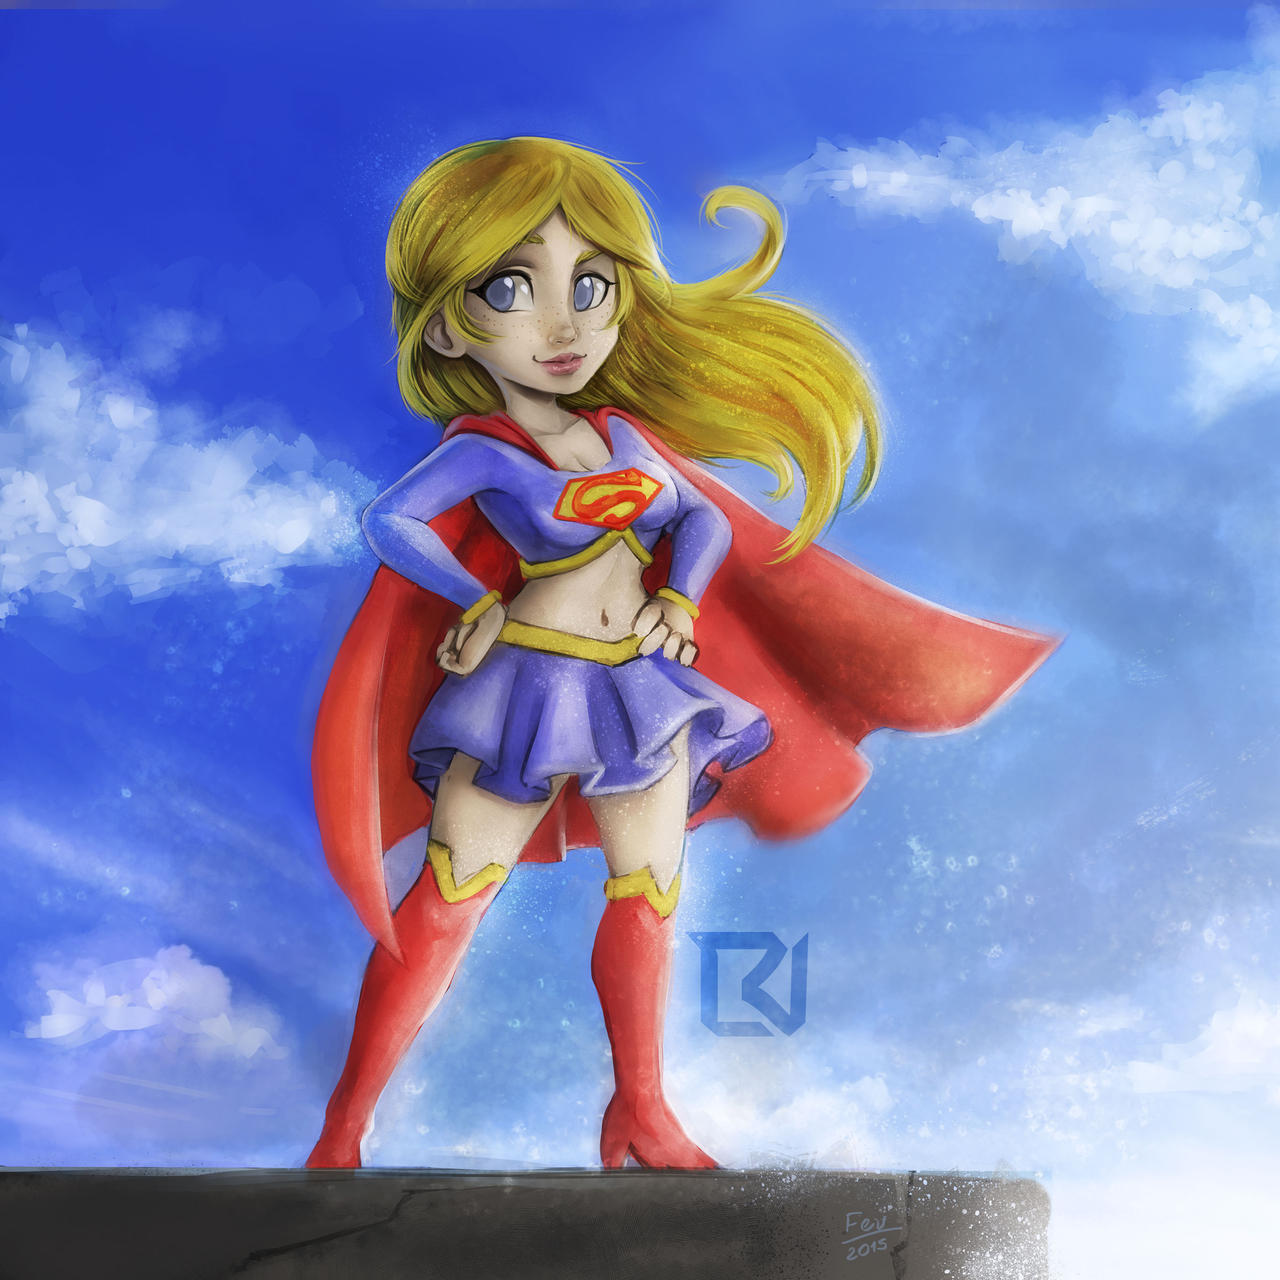 Supergirl by LuizRaffaello